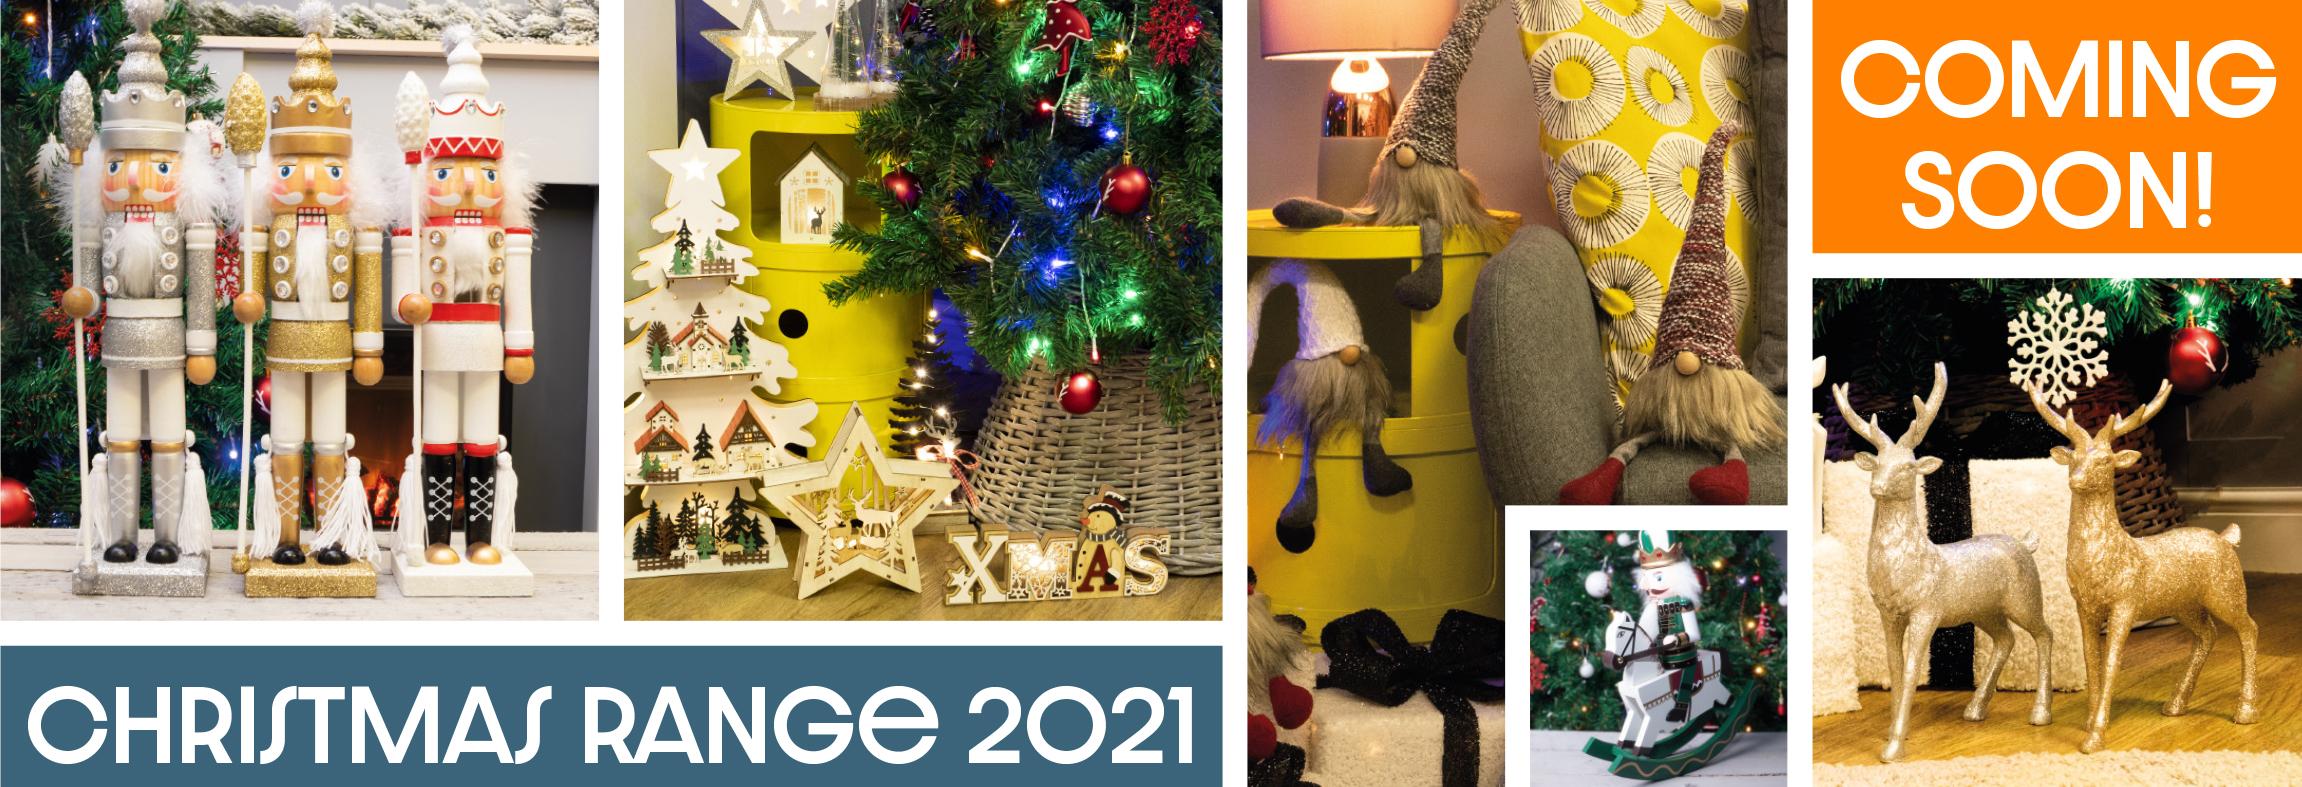 Christmas Decoration Range